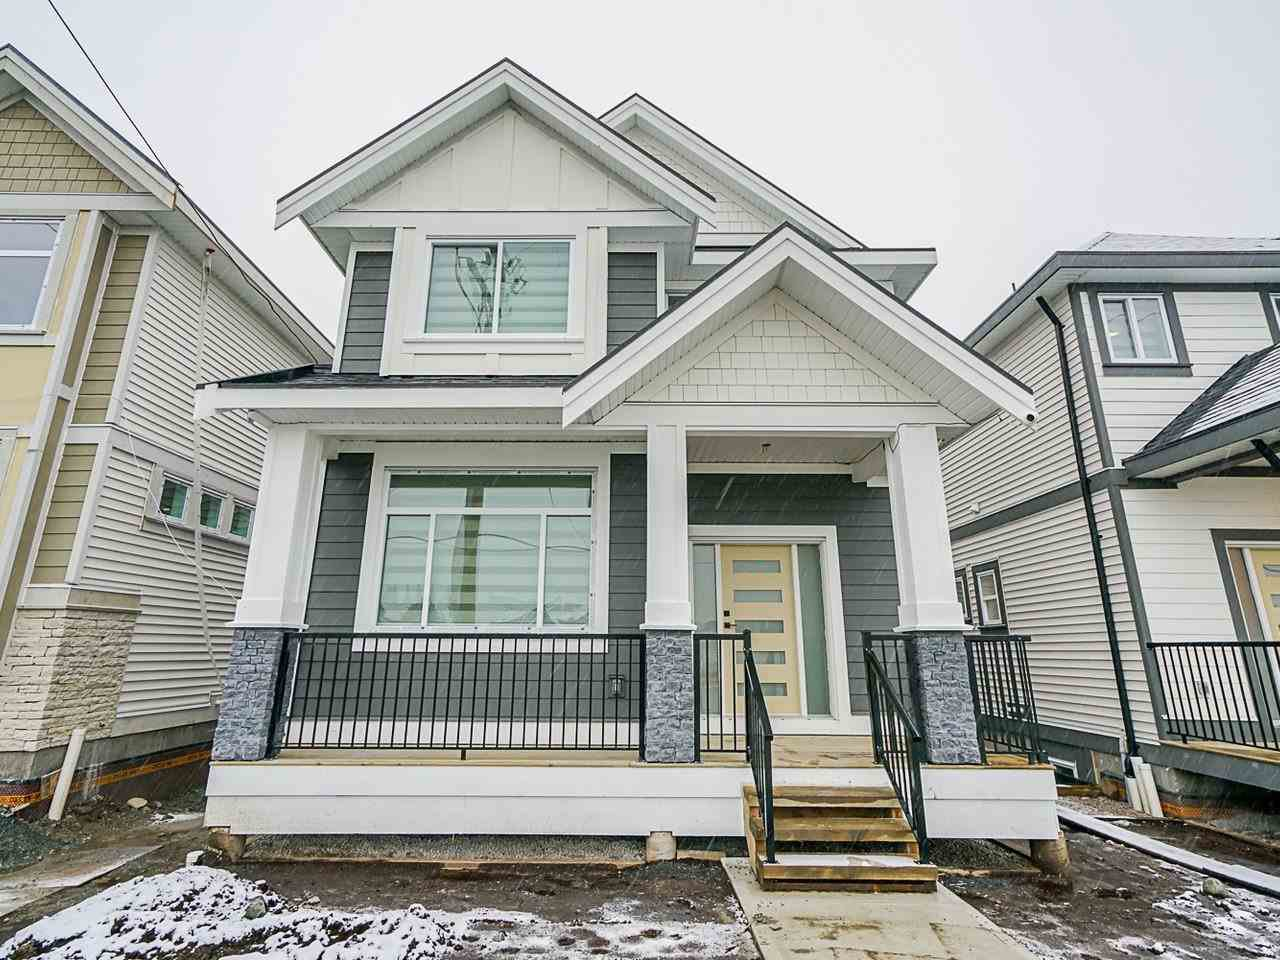 Main Photo: 11036 240 STREET in Maple Ridge: Cottonwood MR House for sale : MLS®# R2461636